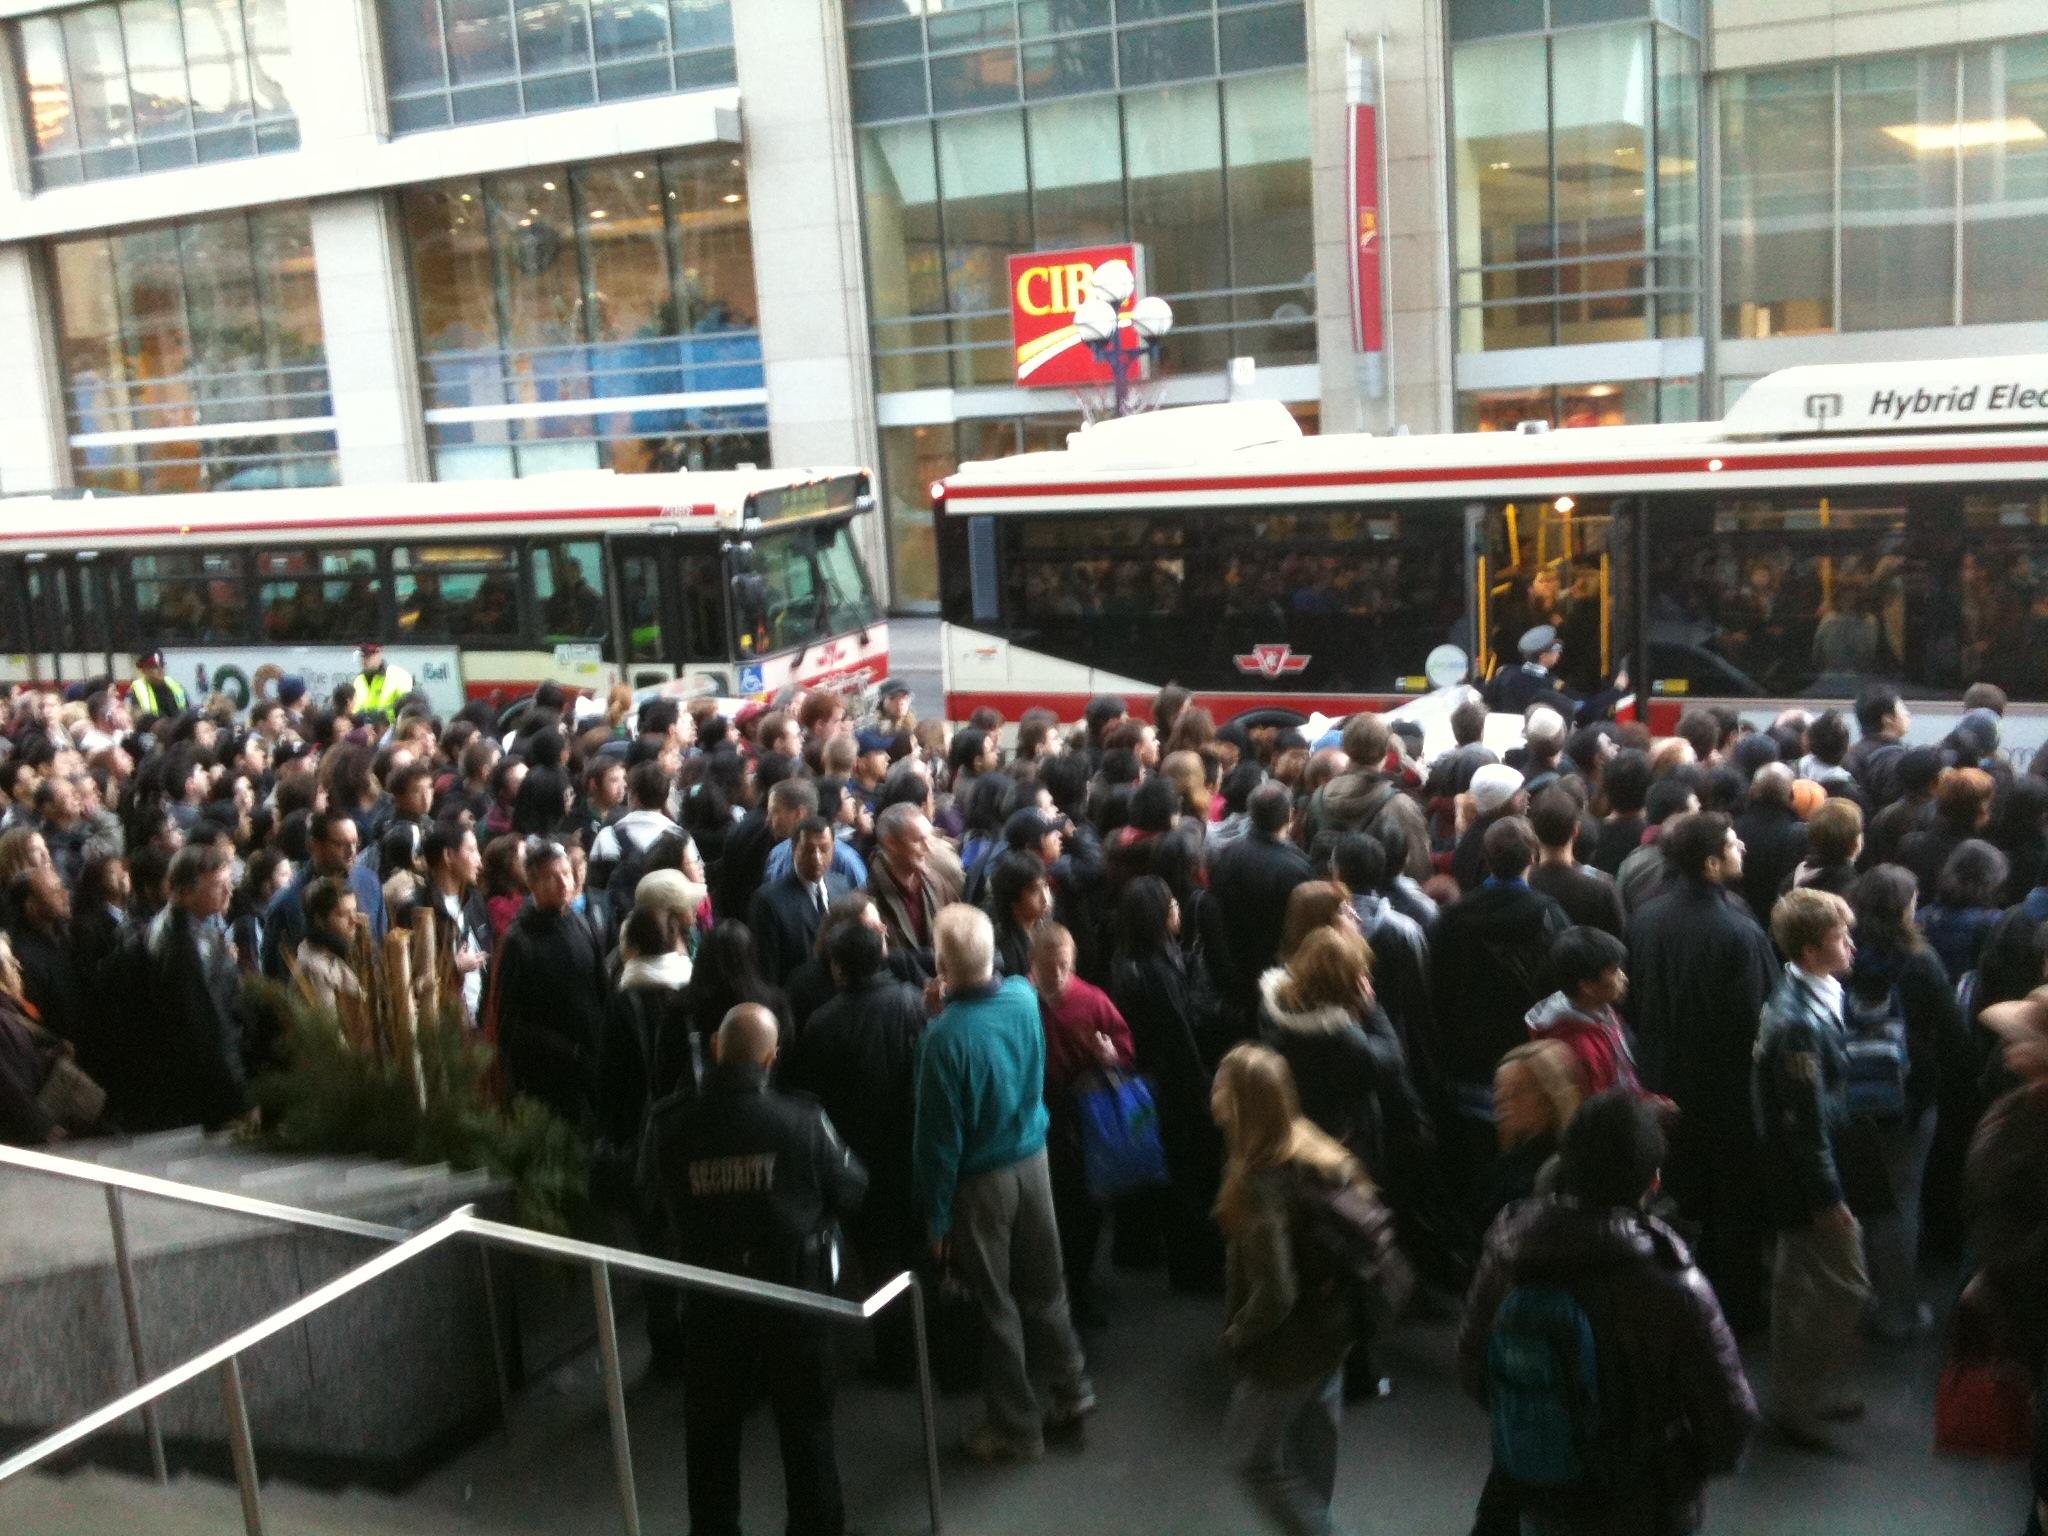 Toronto Transit Commission Incidents Wikipedia